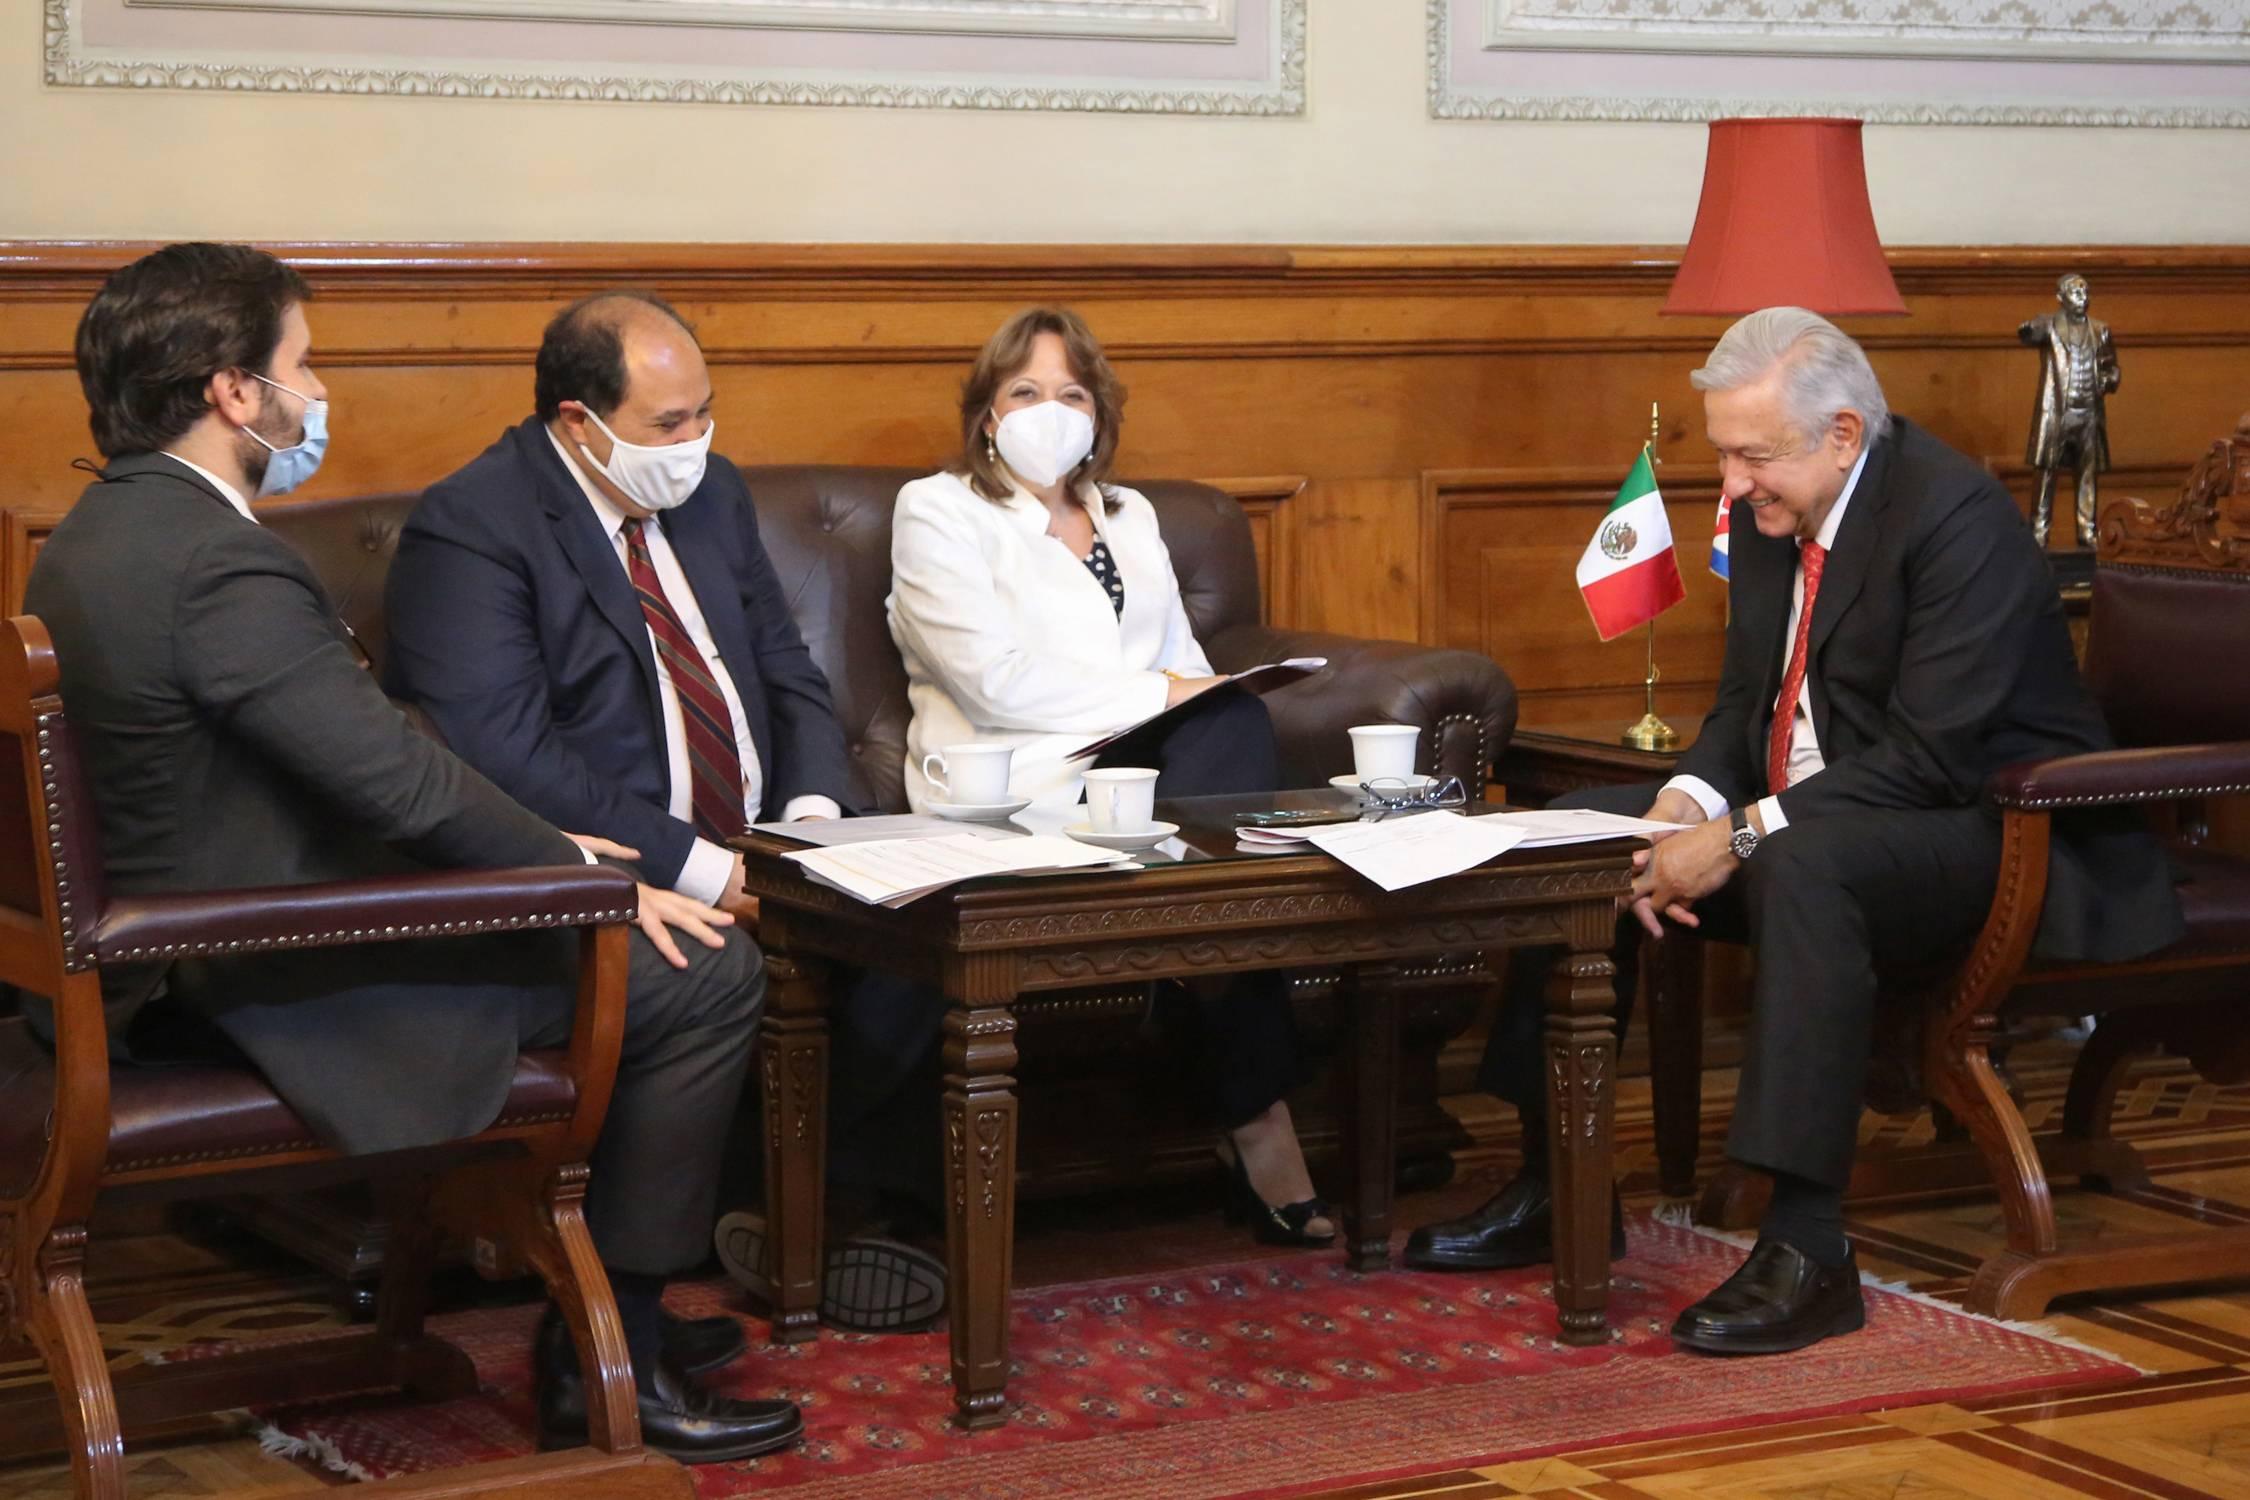 Gracias por personal médico: AMLO conversa con presidente de Cuba